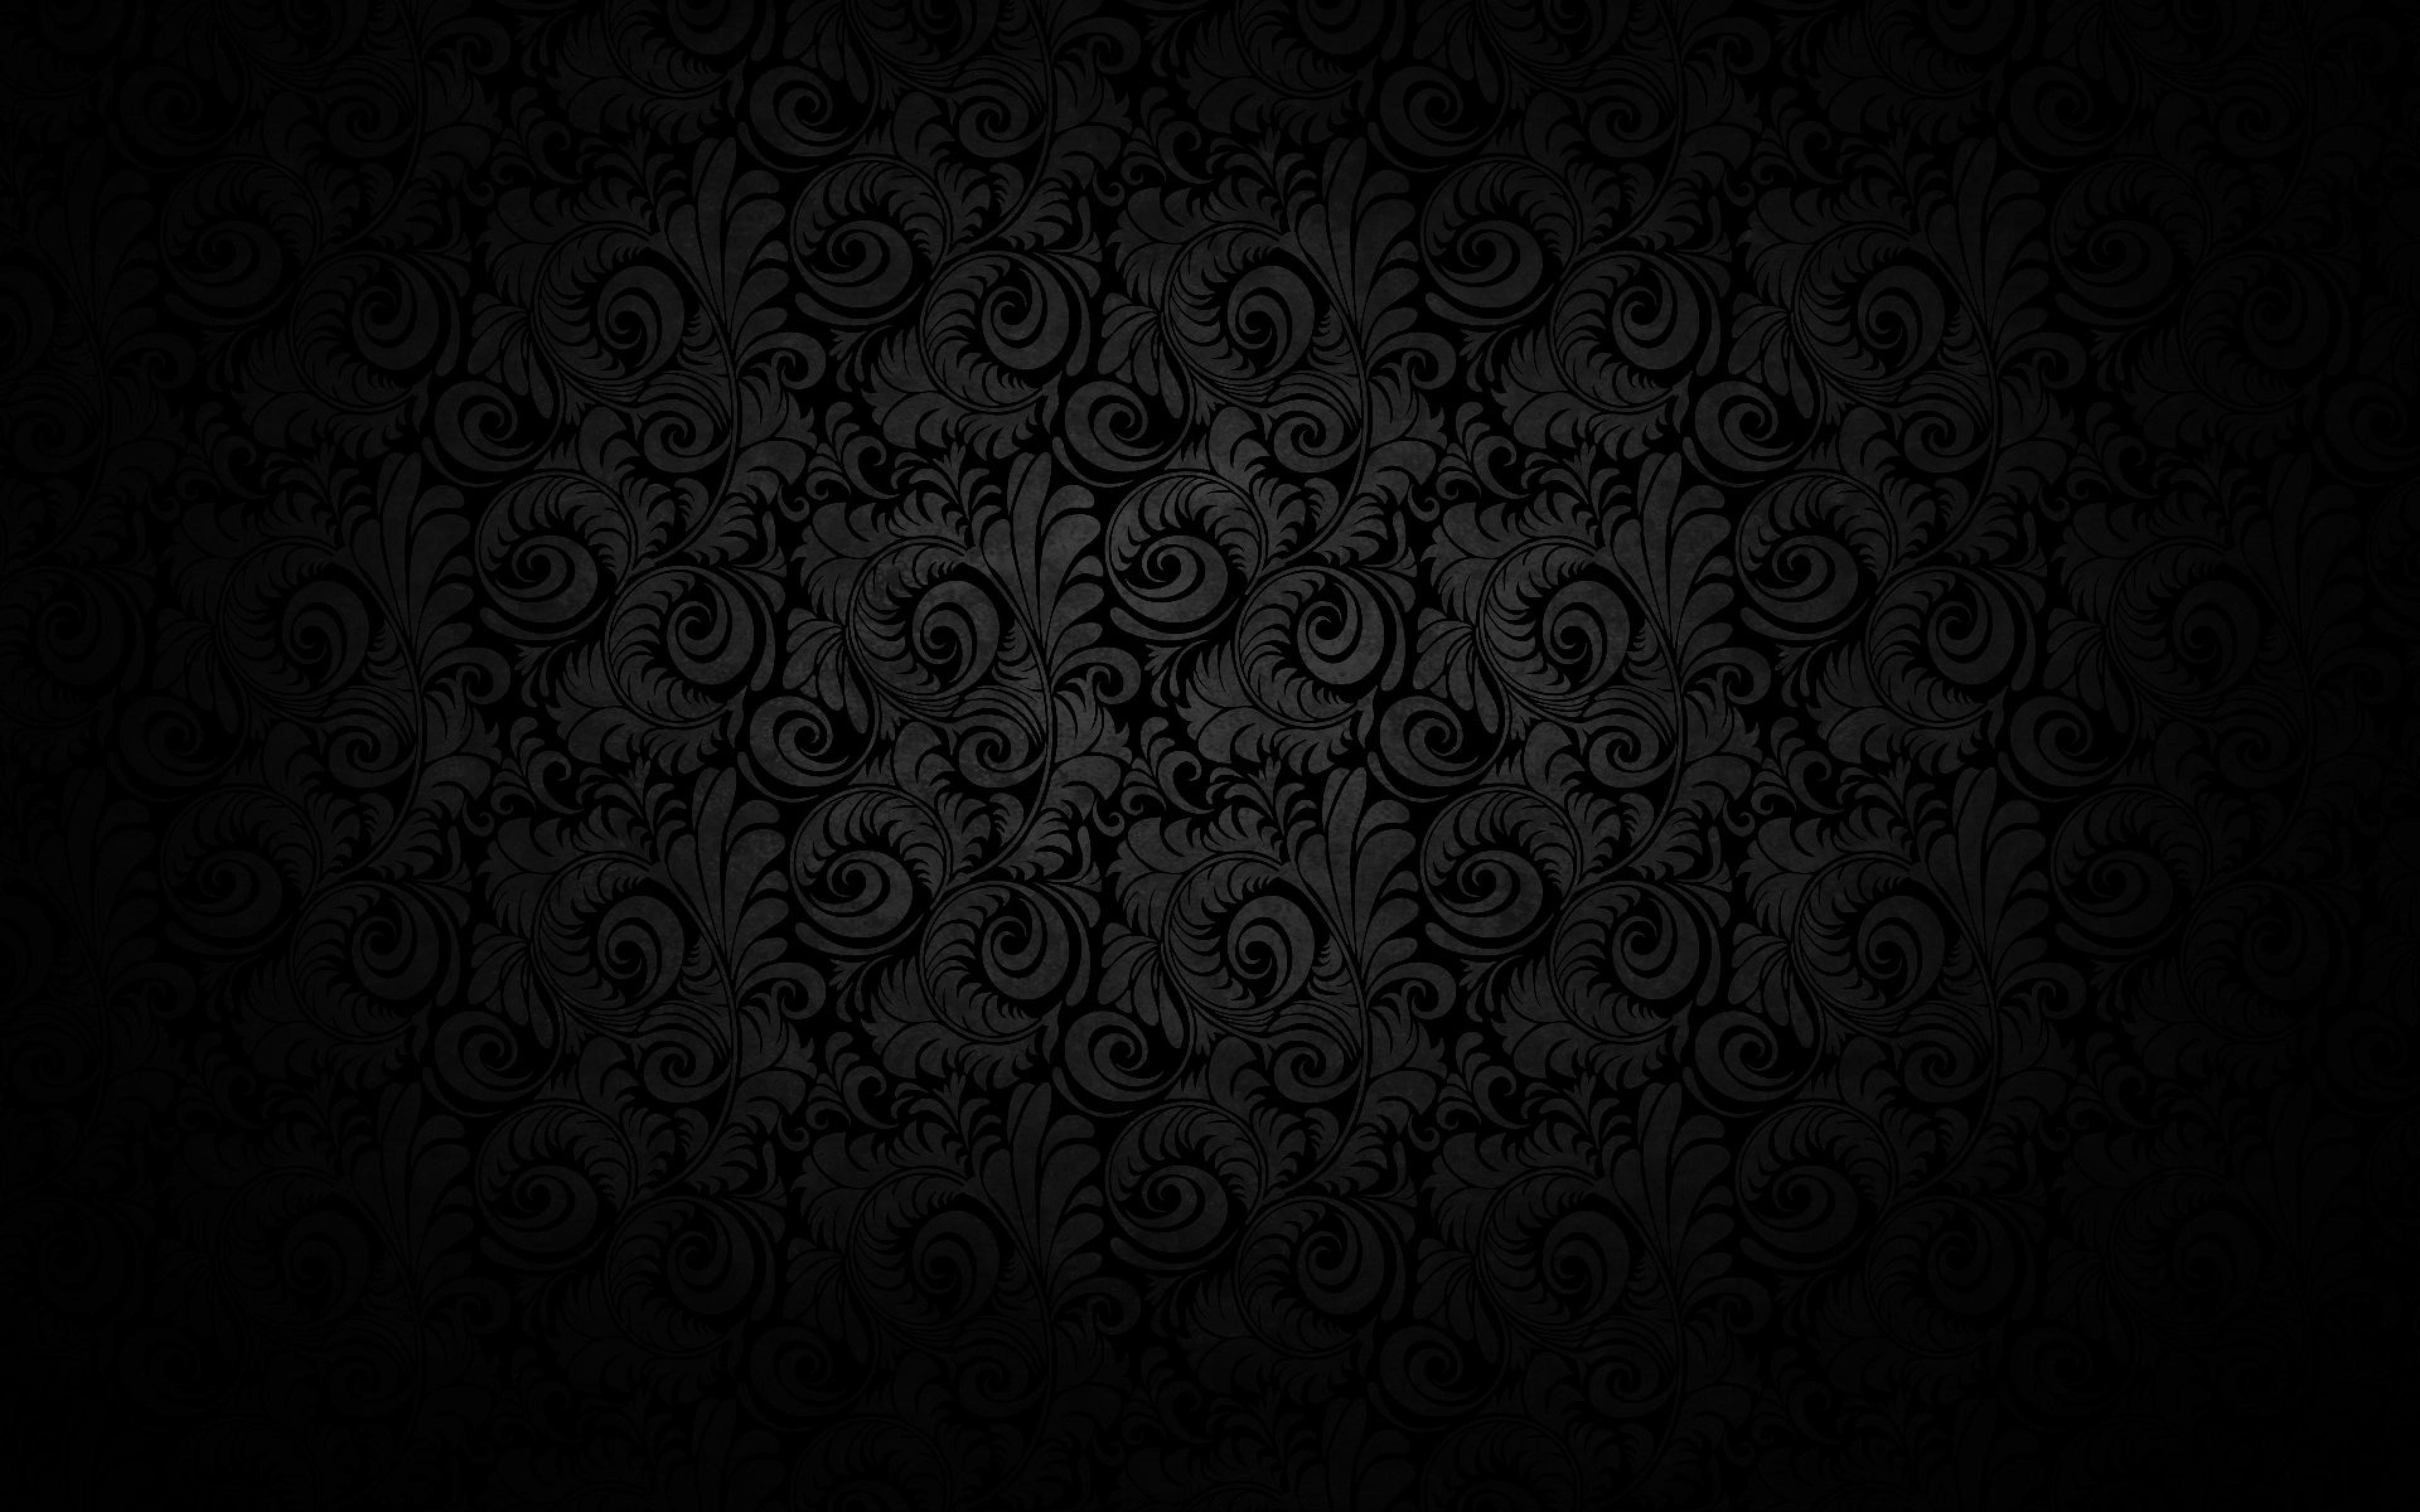 black-background-7